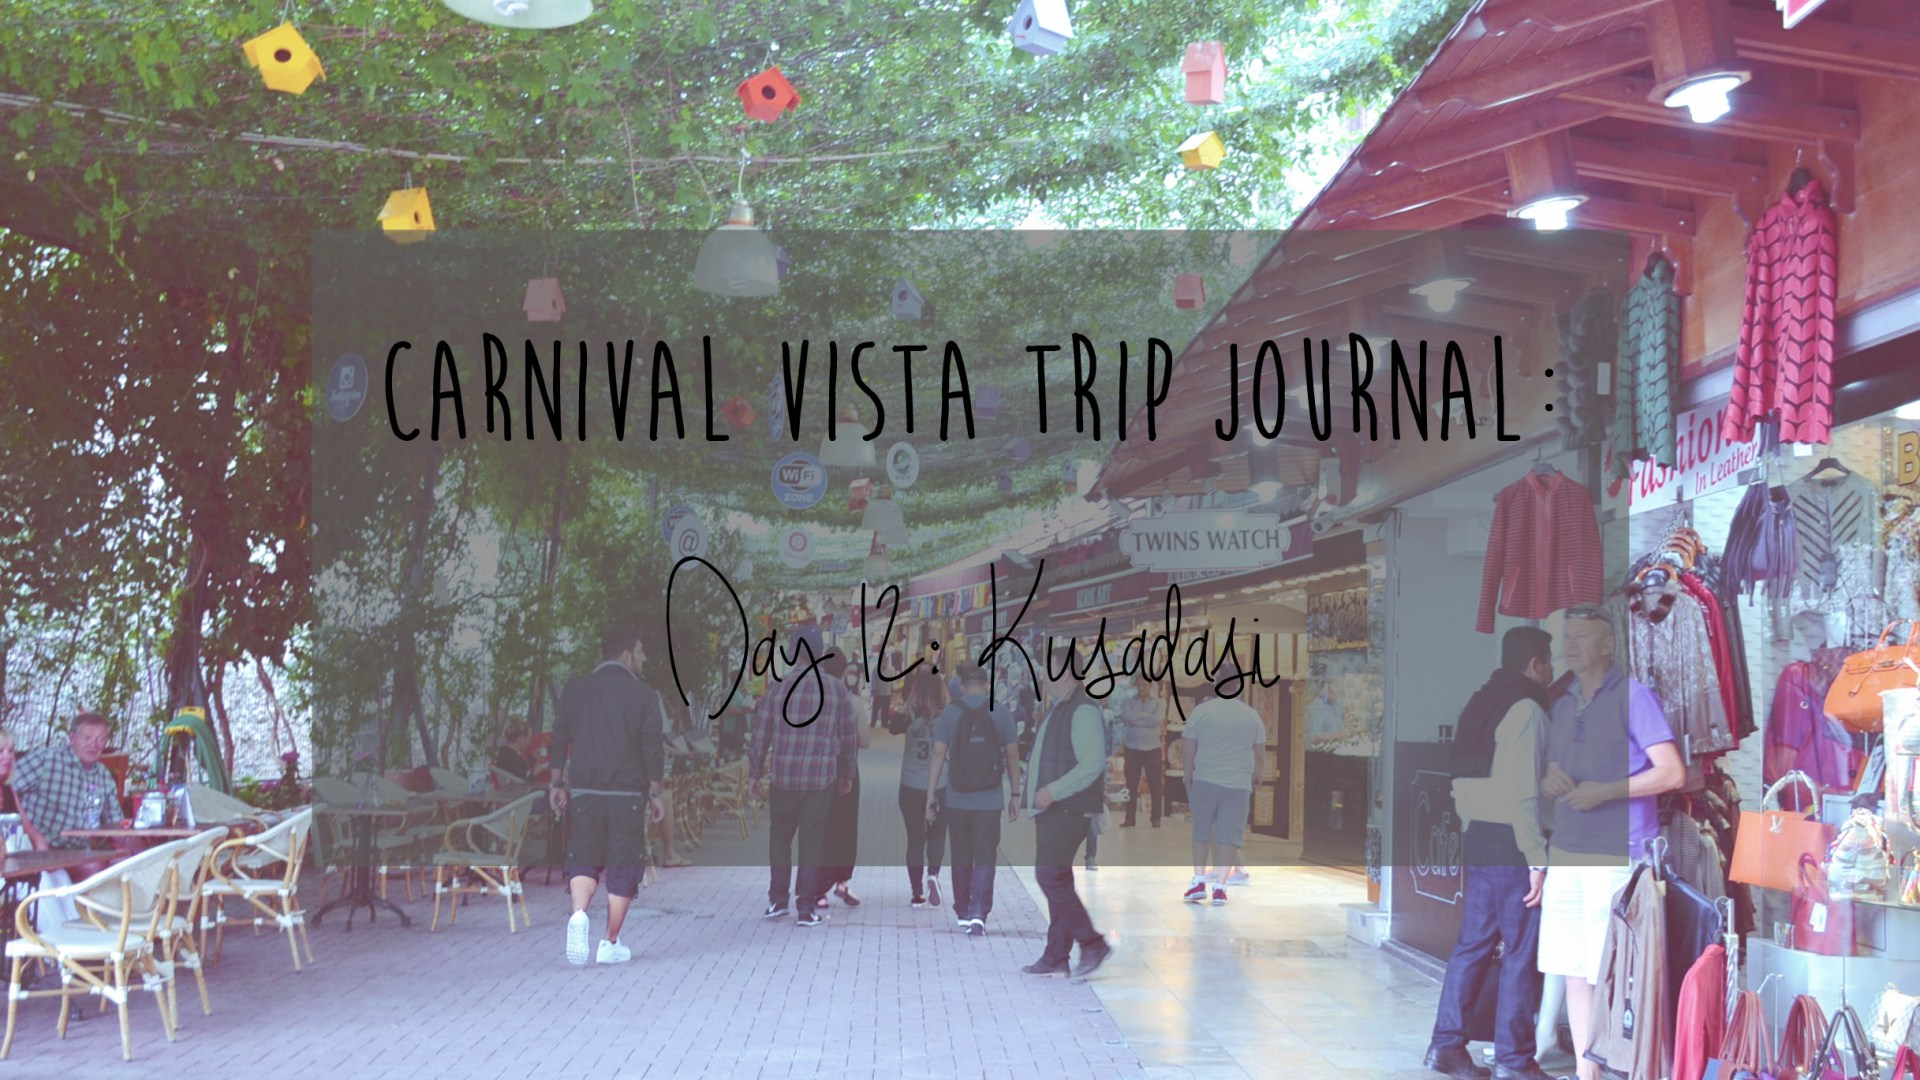 Carnival Vista Review: Day 12 – Kusadasi